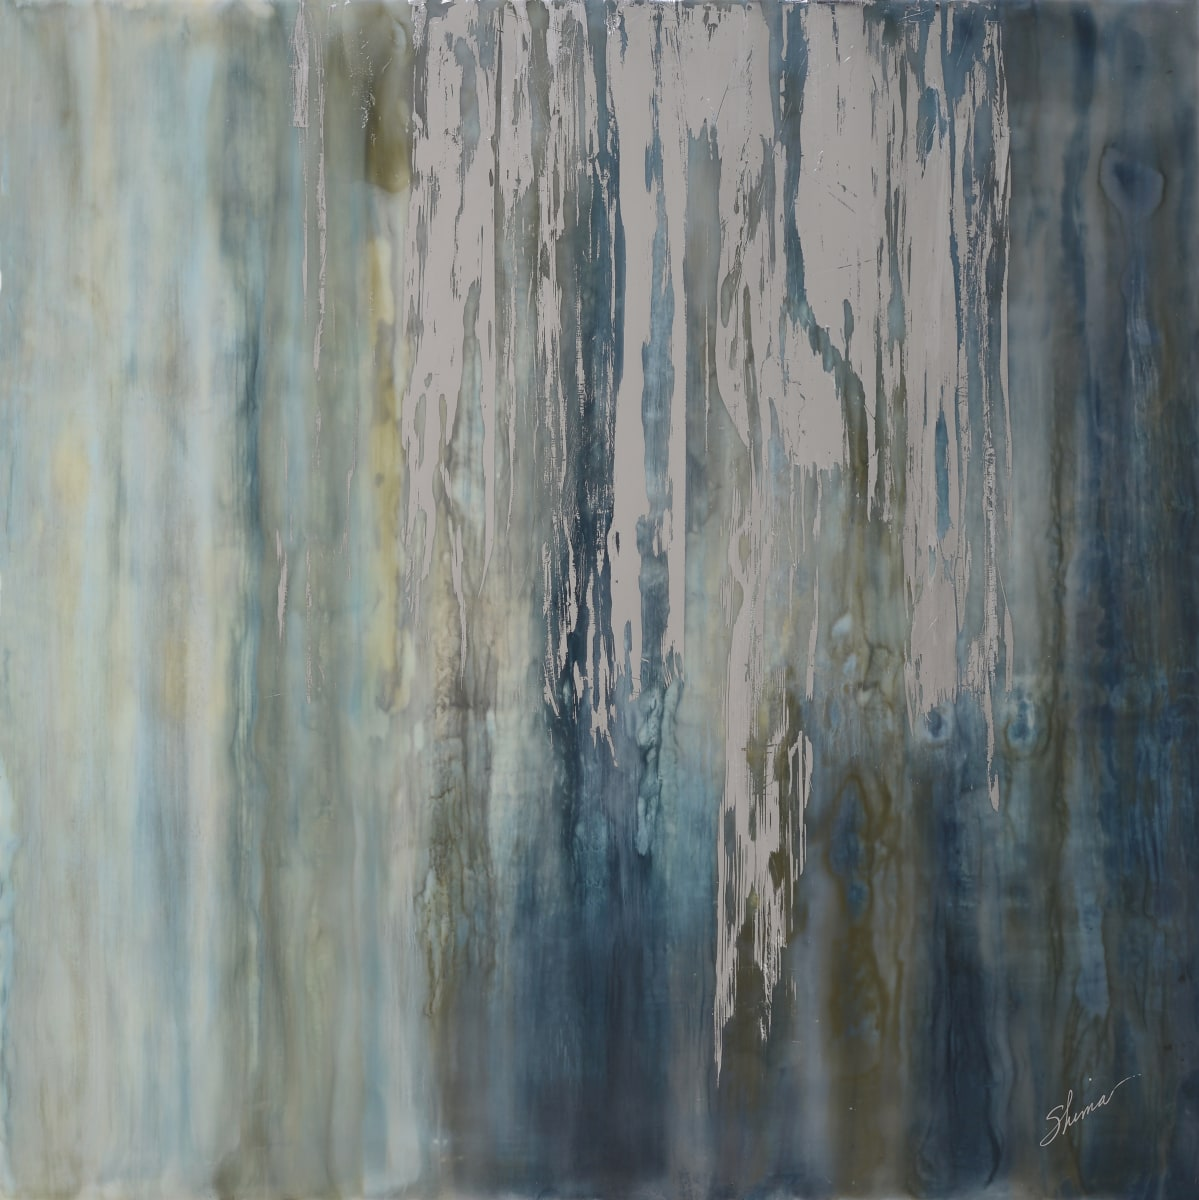 The Weeping Wall by Shima Shanti